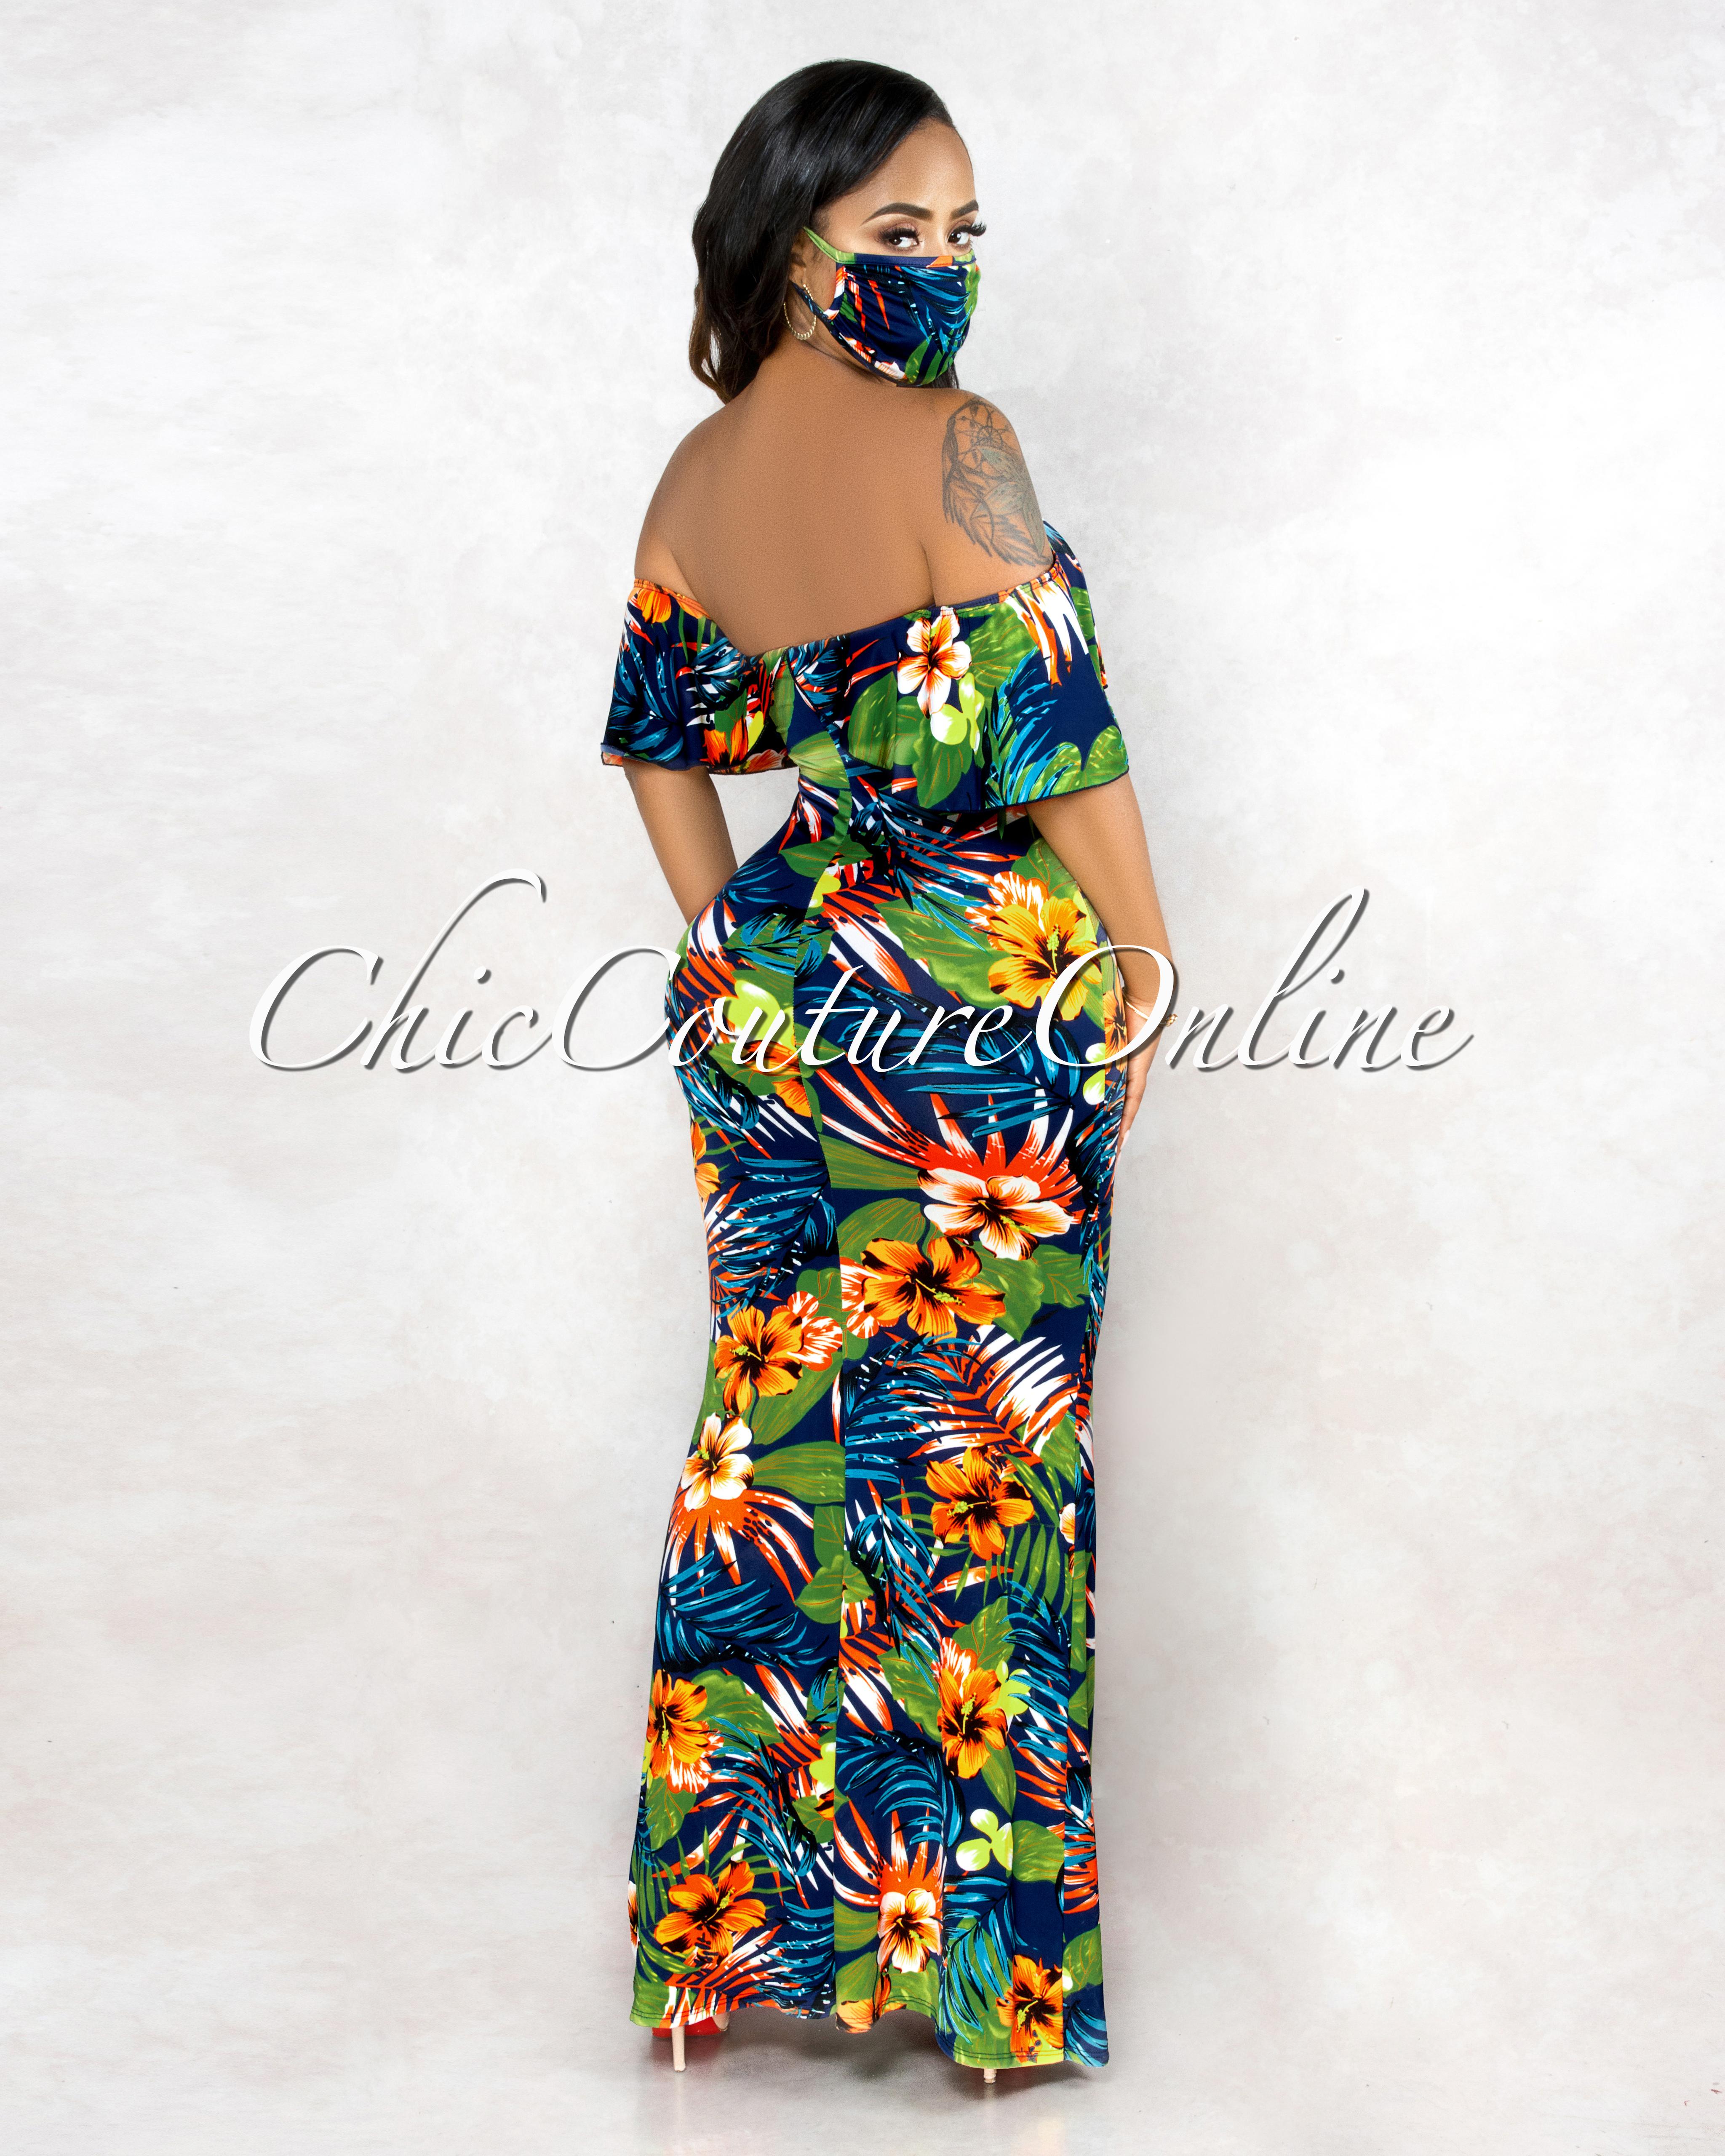 Oliana Navy Blue Multi-Color Print Back Off The Shoulder & Mask Maxi Dress